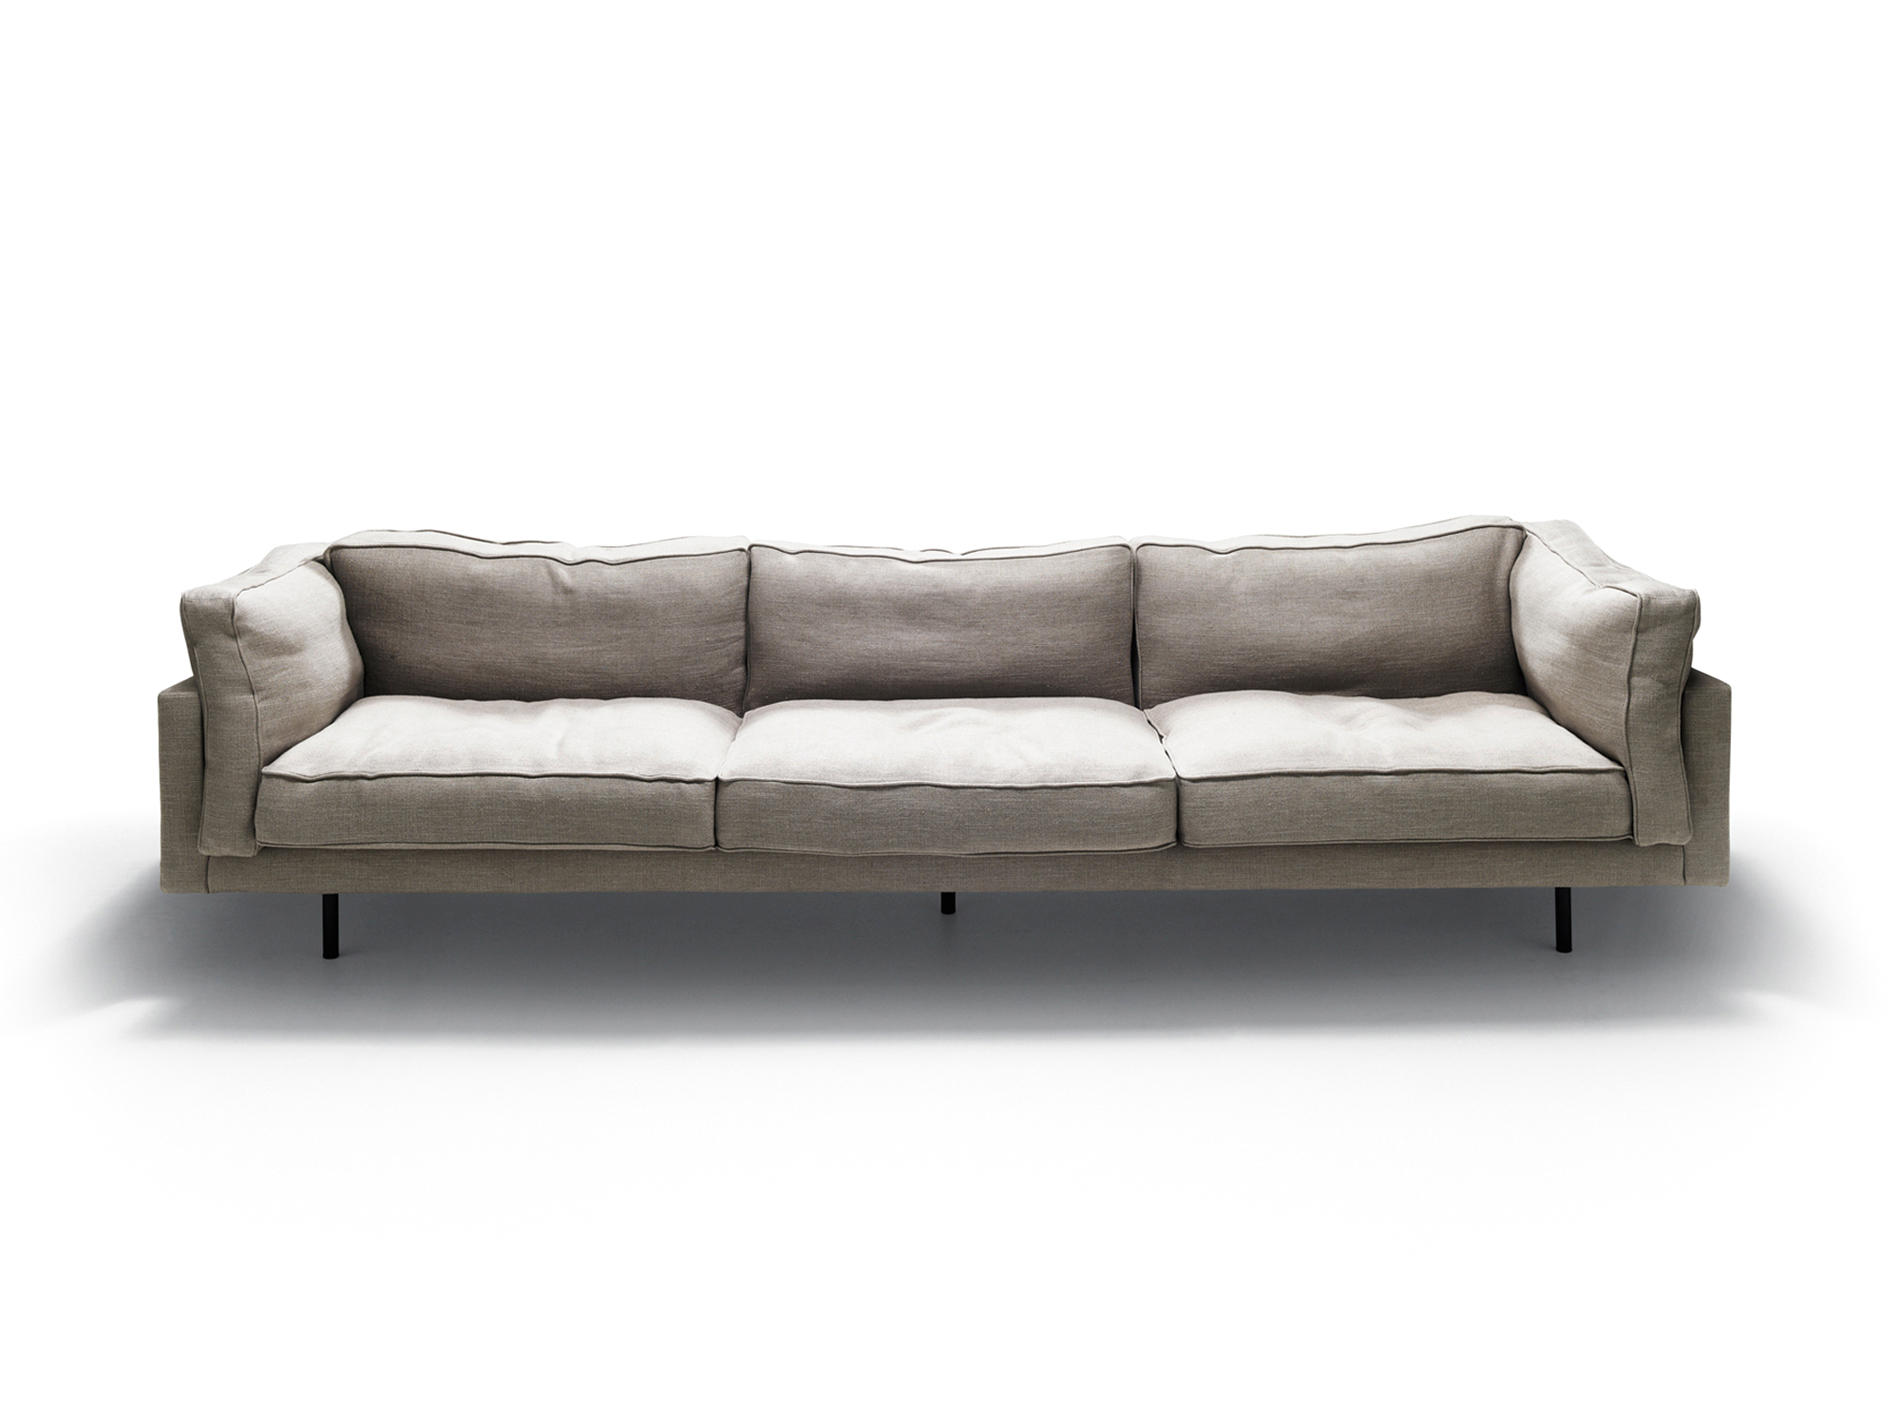 SQUARE 16 - Lounge sofas from De Padova | Architonic